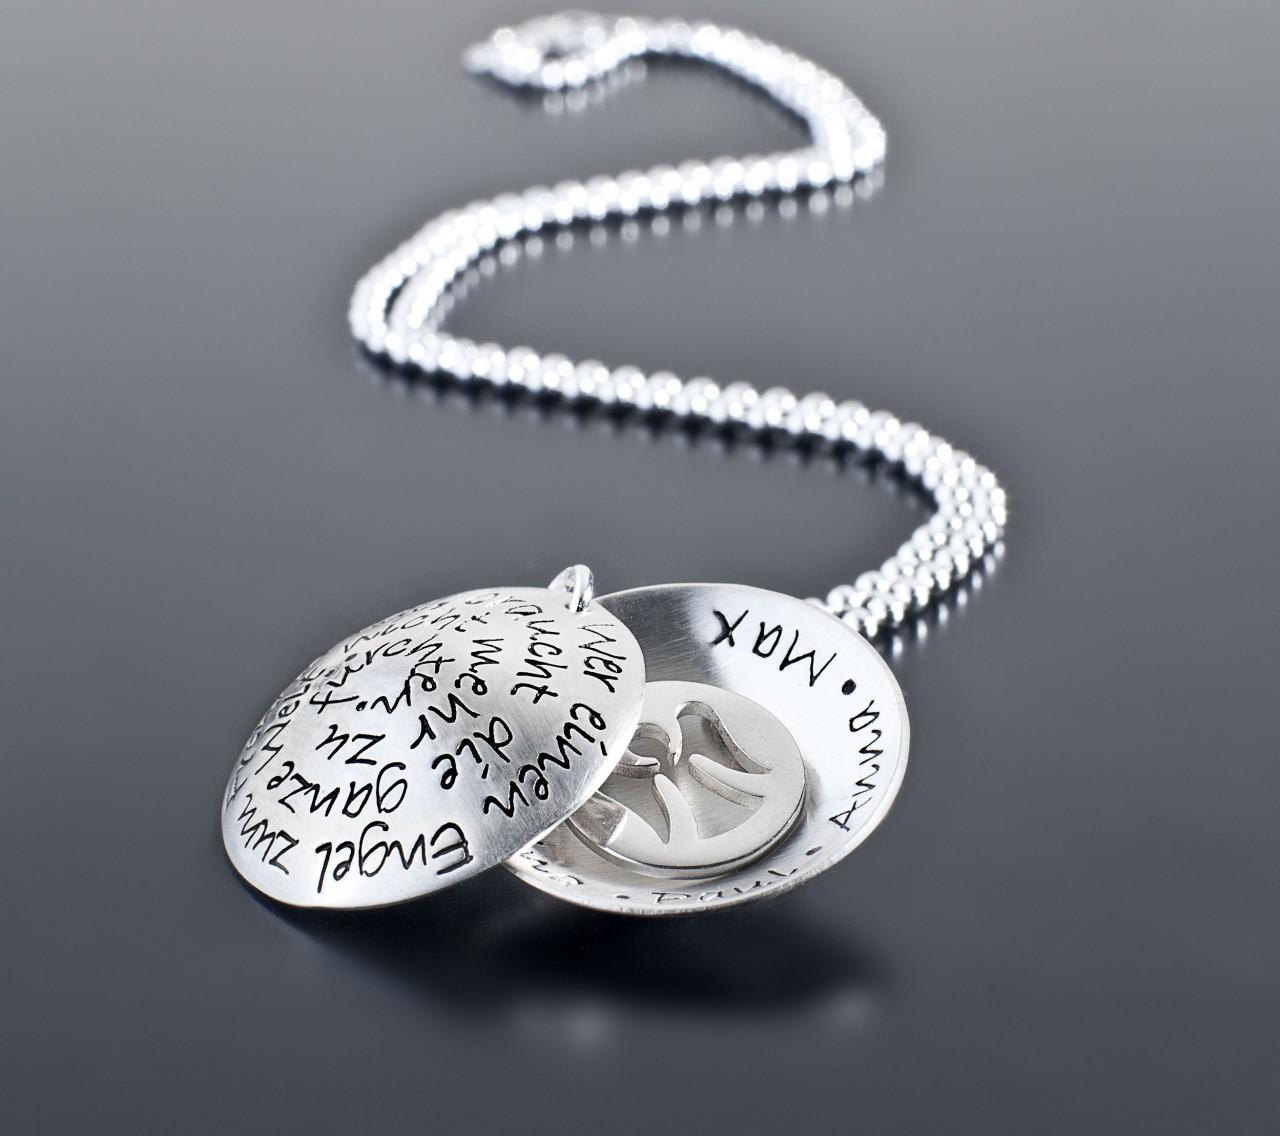 EINEN ENGEL ZUM FREUND 925 Silber Medaillon, Kette mit Wunschtext